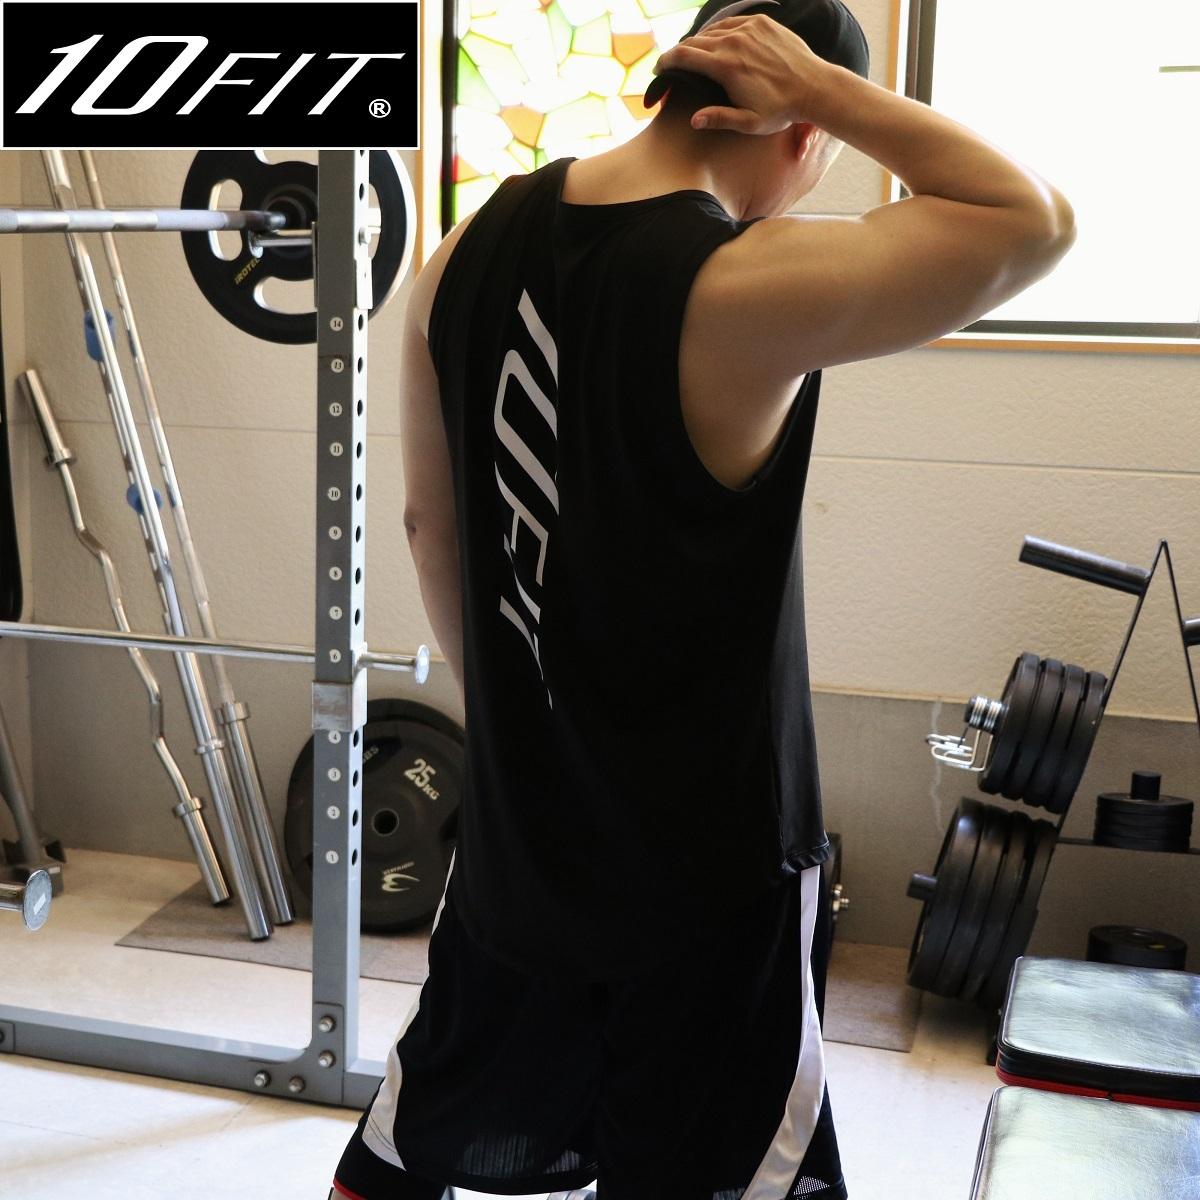 10FIT タンクトップ トレーニング 筋トレ ボディビル メンズ TE-22 黒 ロング丈